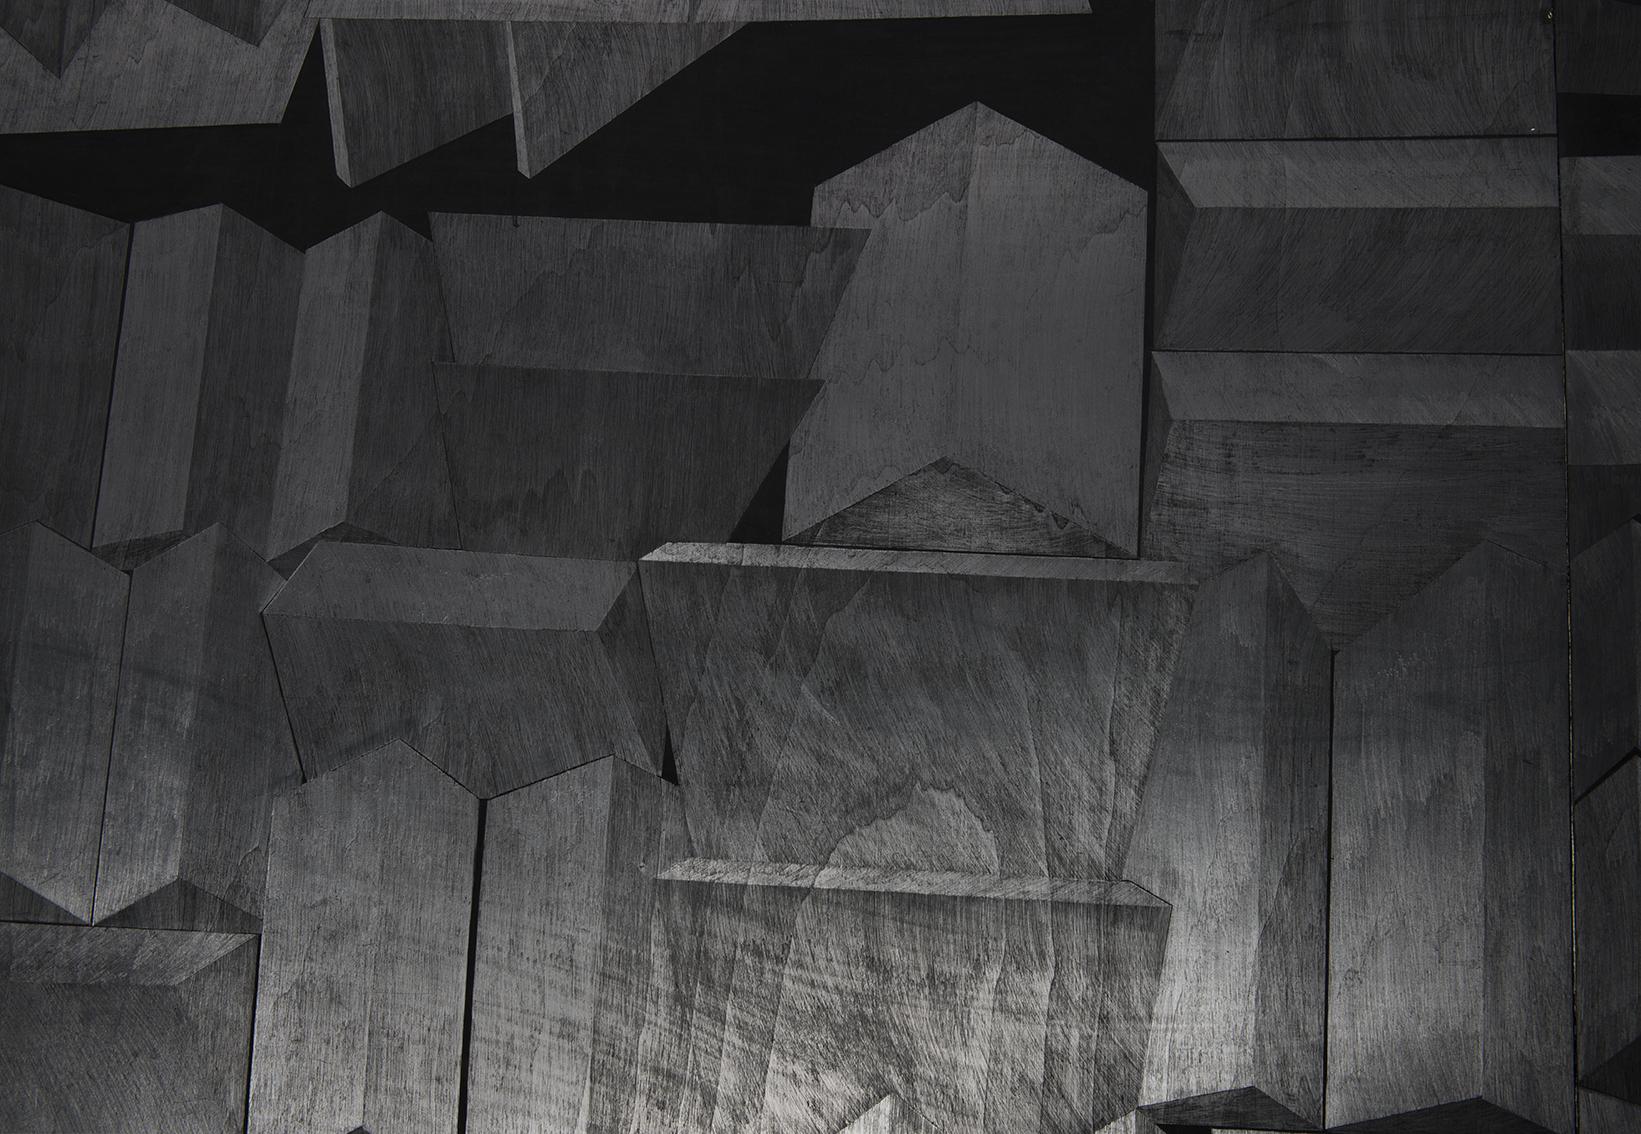 Hado, פחם וגרפיט על עץ, פרט מתוך מיצב, 2014 (2).jpg